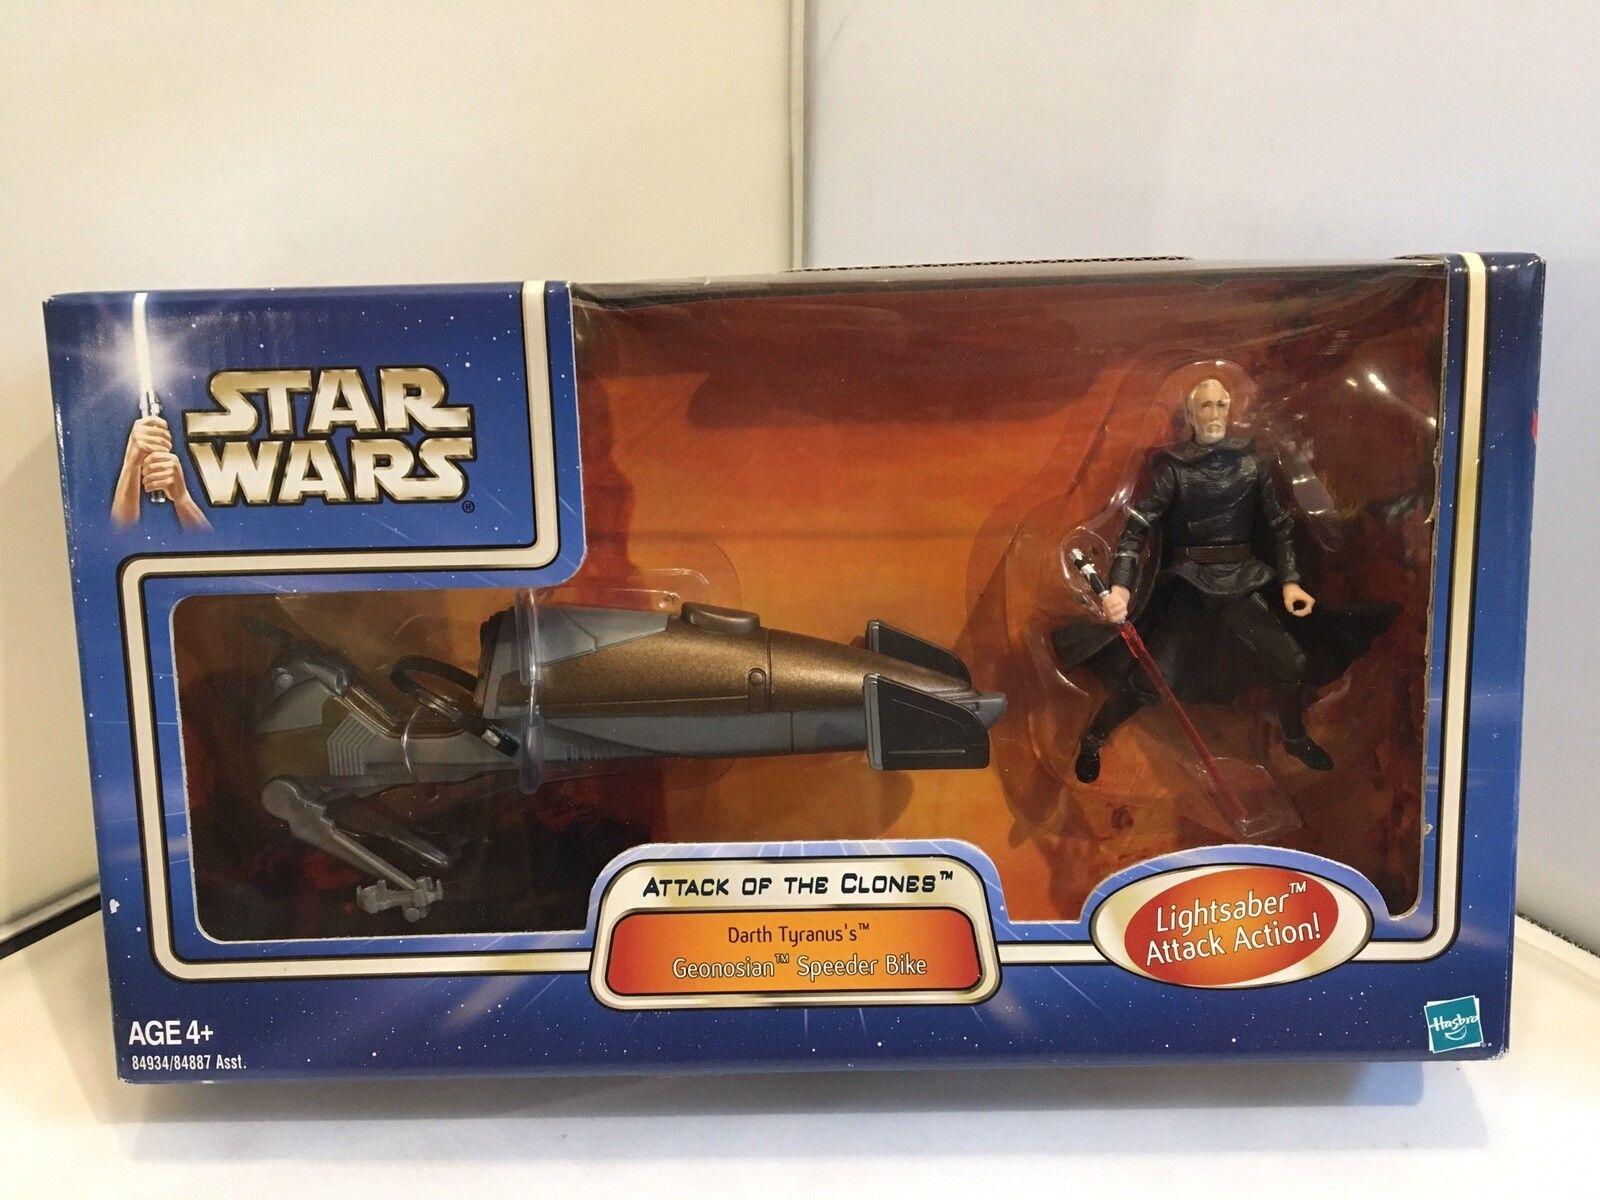 STAR WARS L'ATTACCO DEI CLONI-Darth tyranus'S Geonosiani Geonosiani Geonosiani Speeder Bike b33ca2